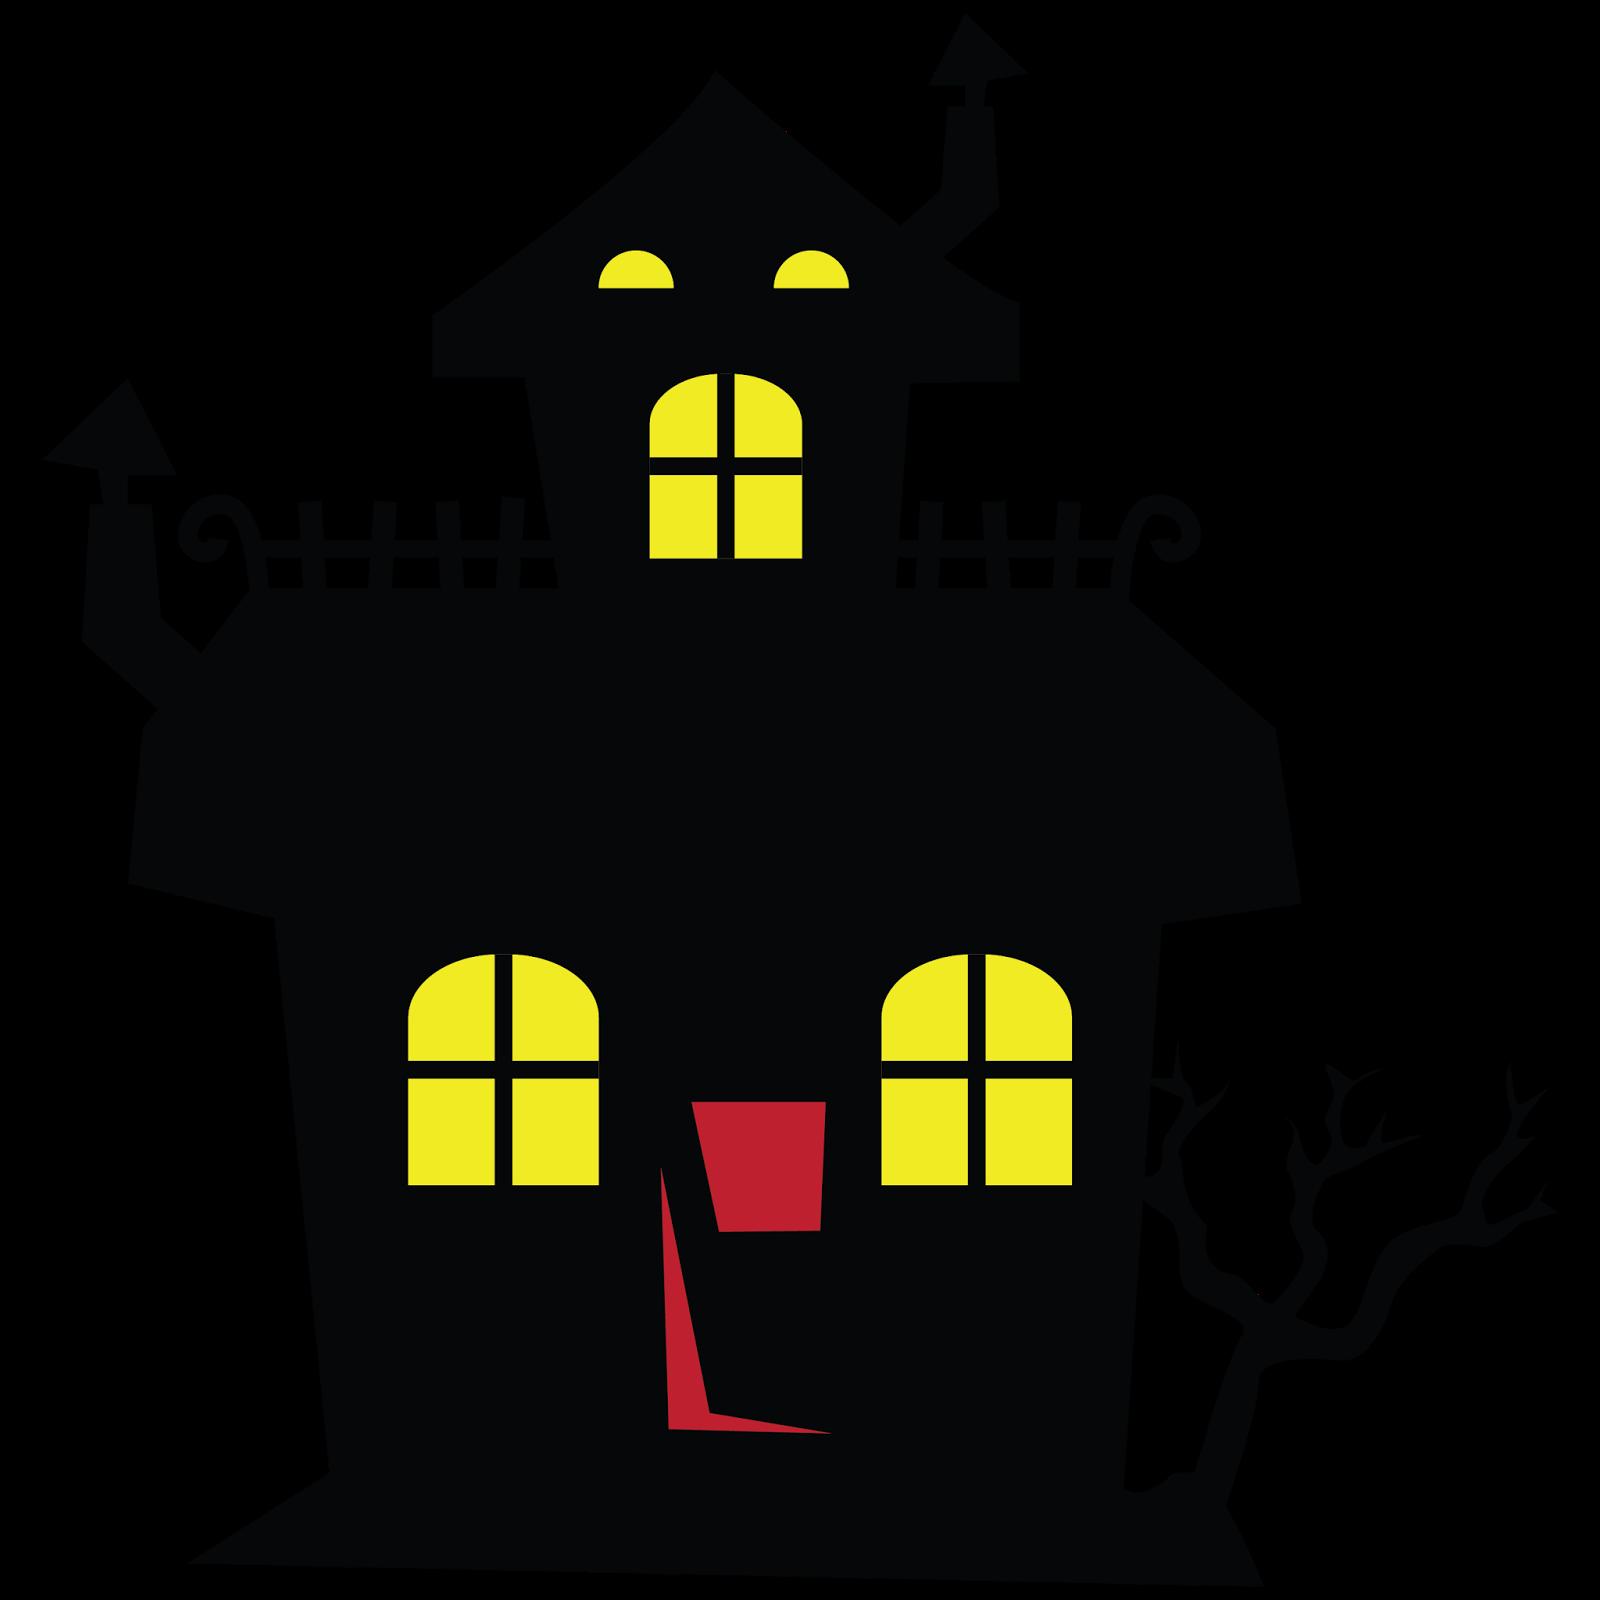 Haunted clipart haunted mansion Masteri Clipart Haunted Png Cartoon